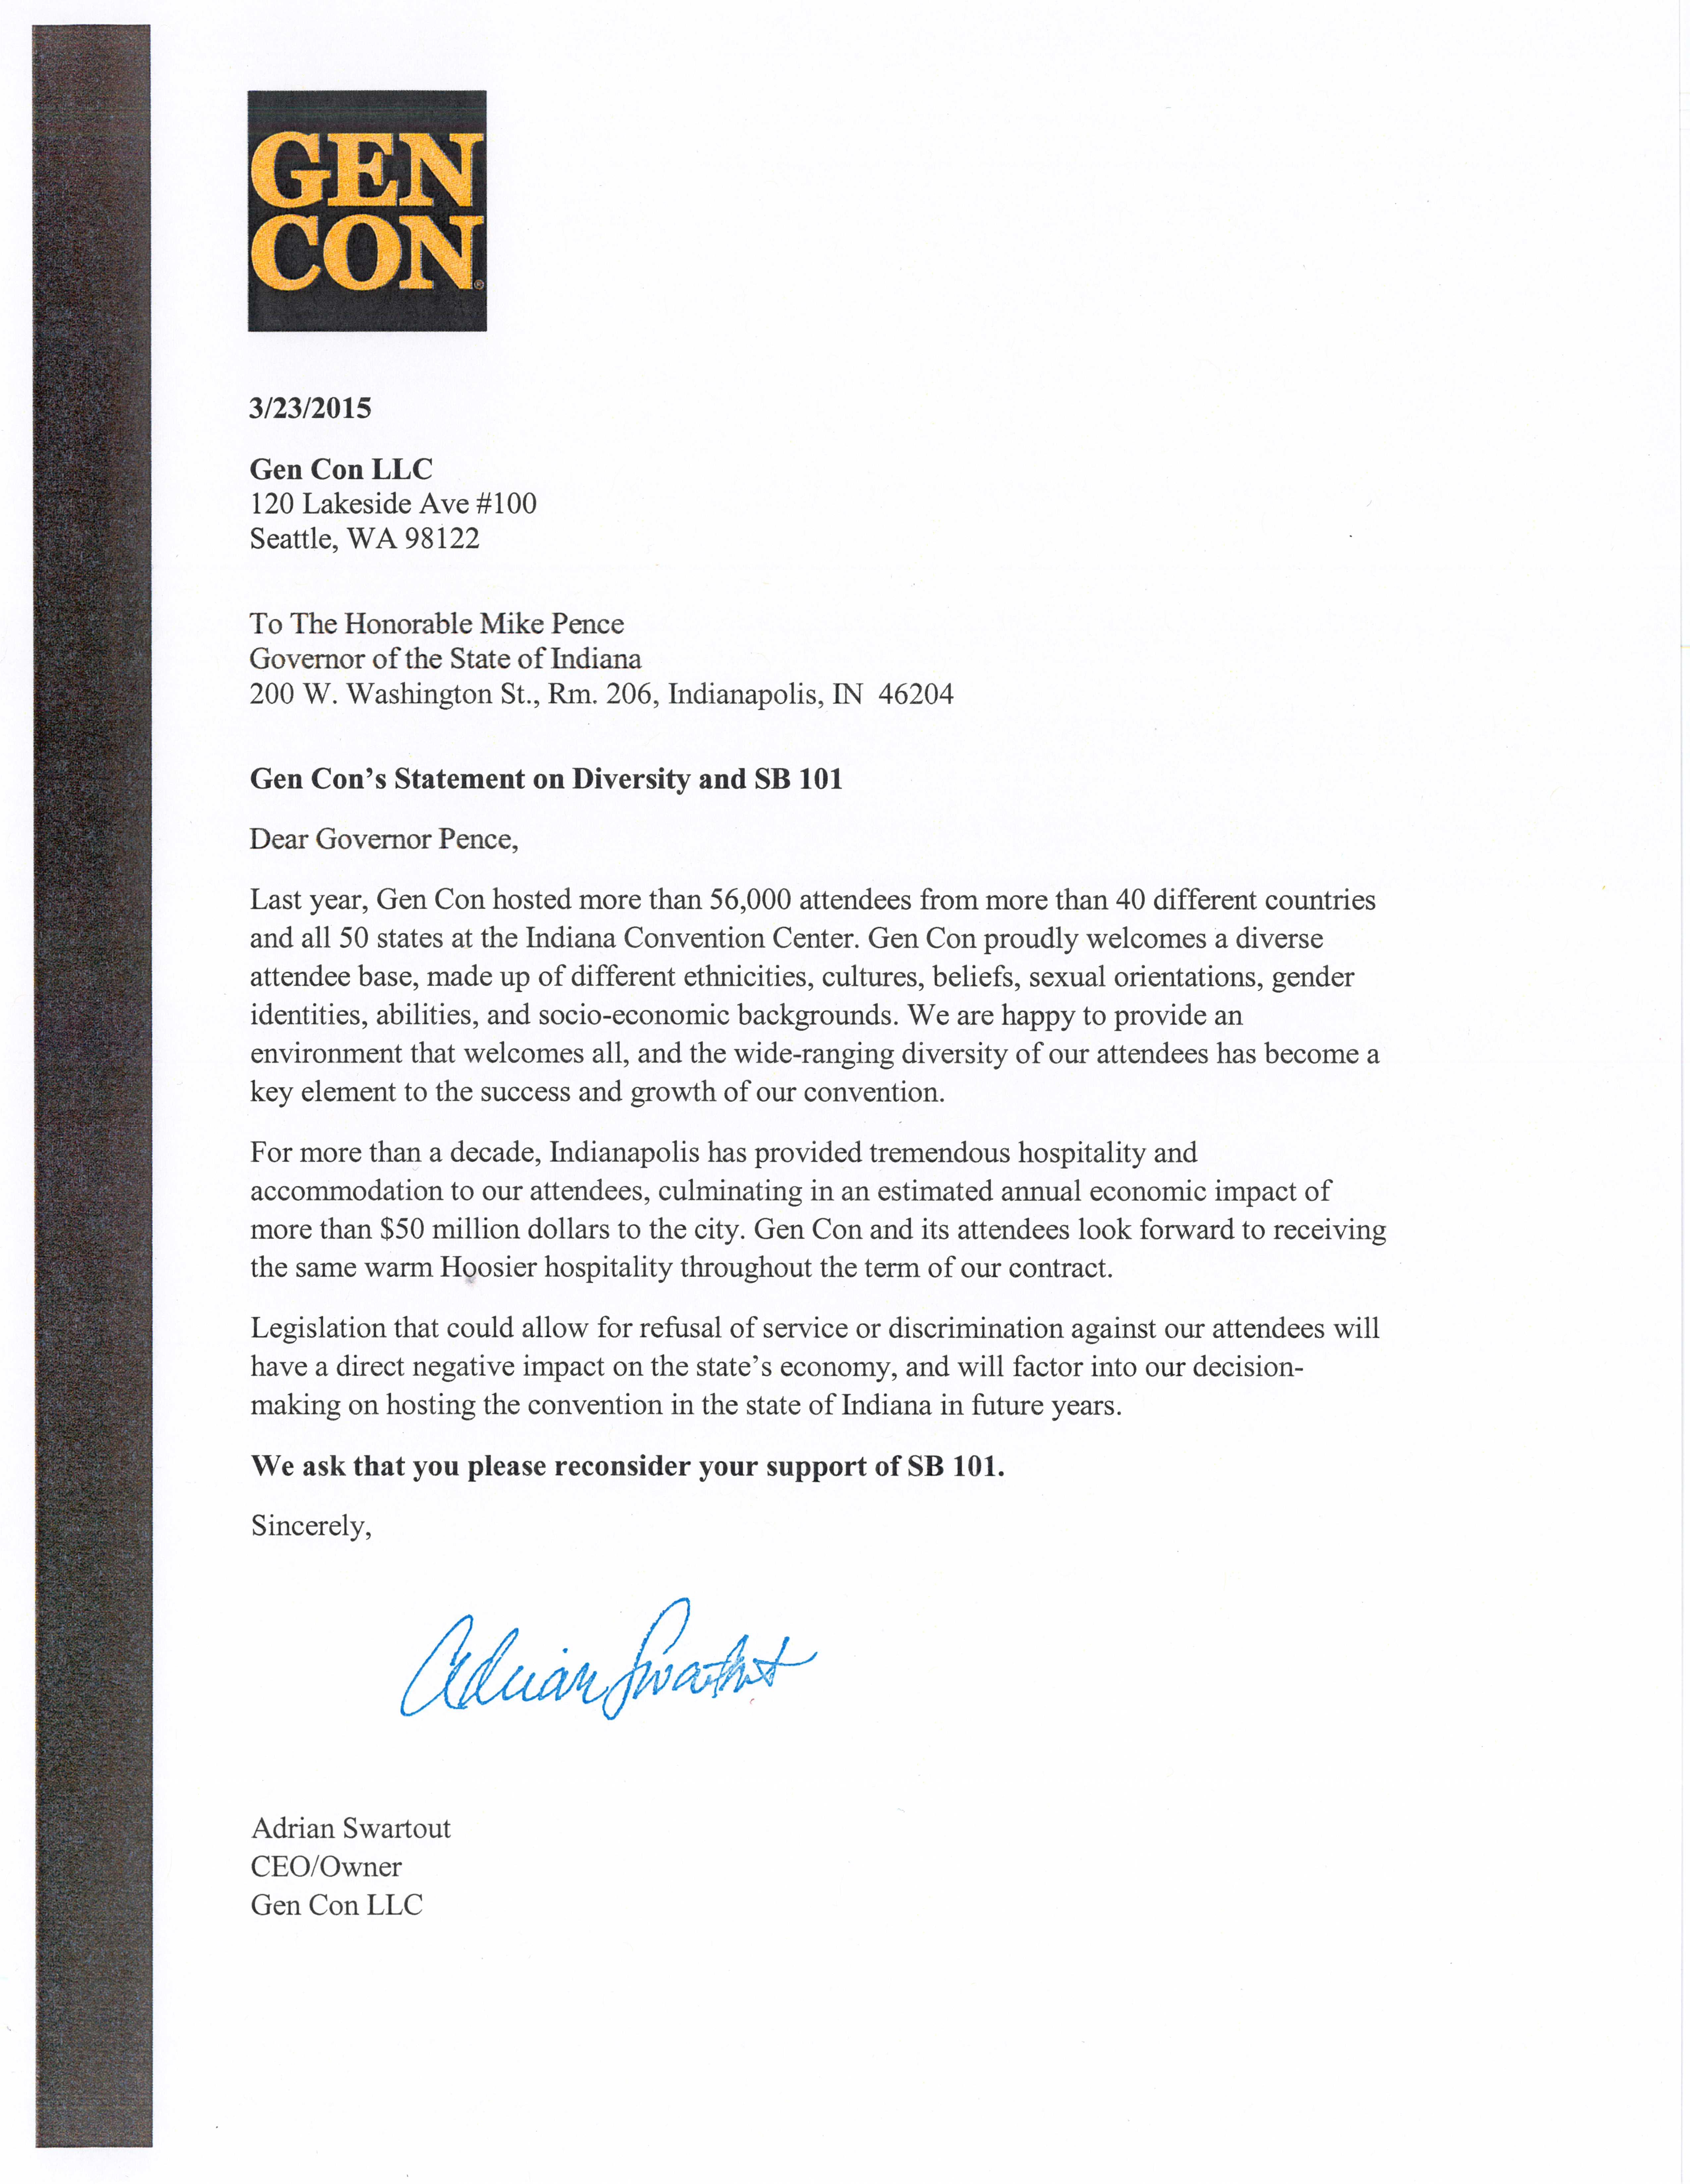 Gen Con Statement Regarding SB 101 (Image: Adrian Swartout)